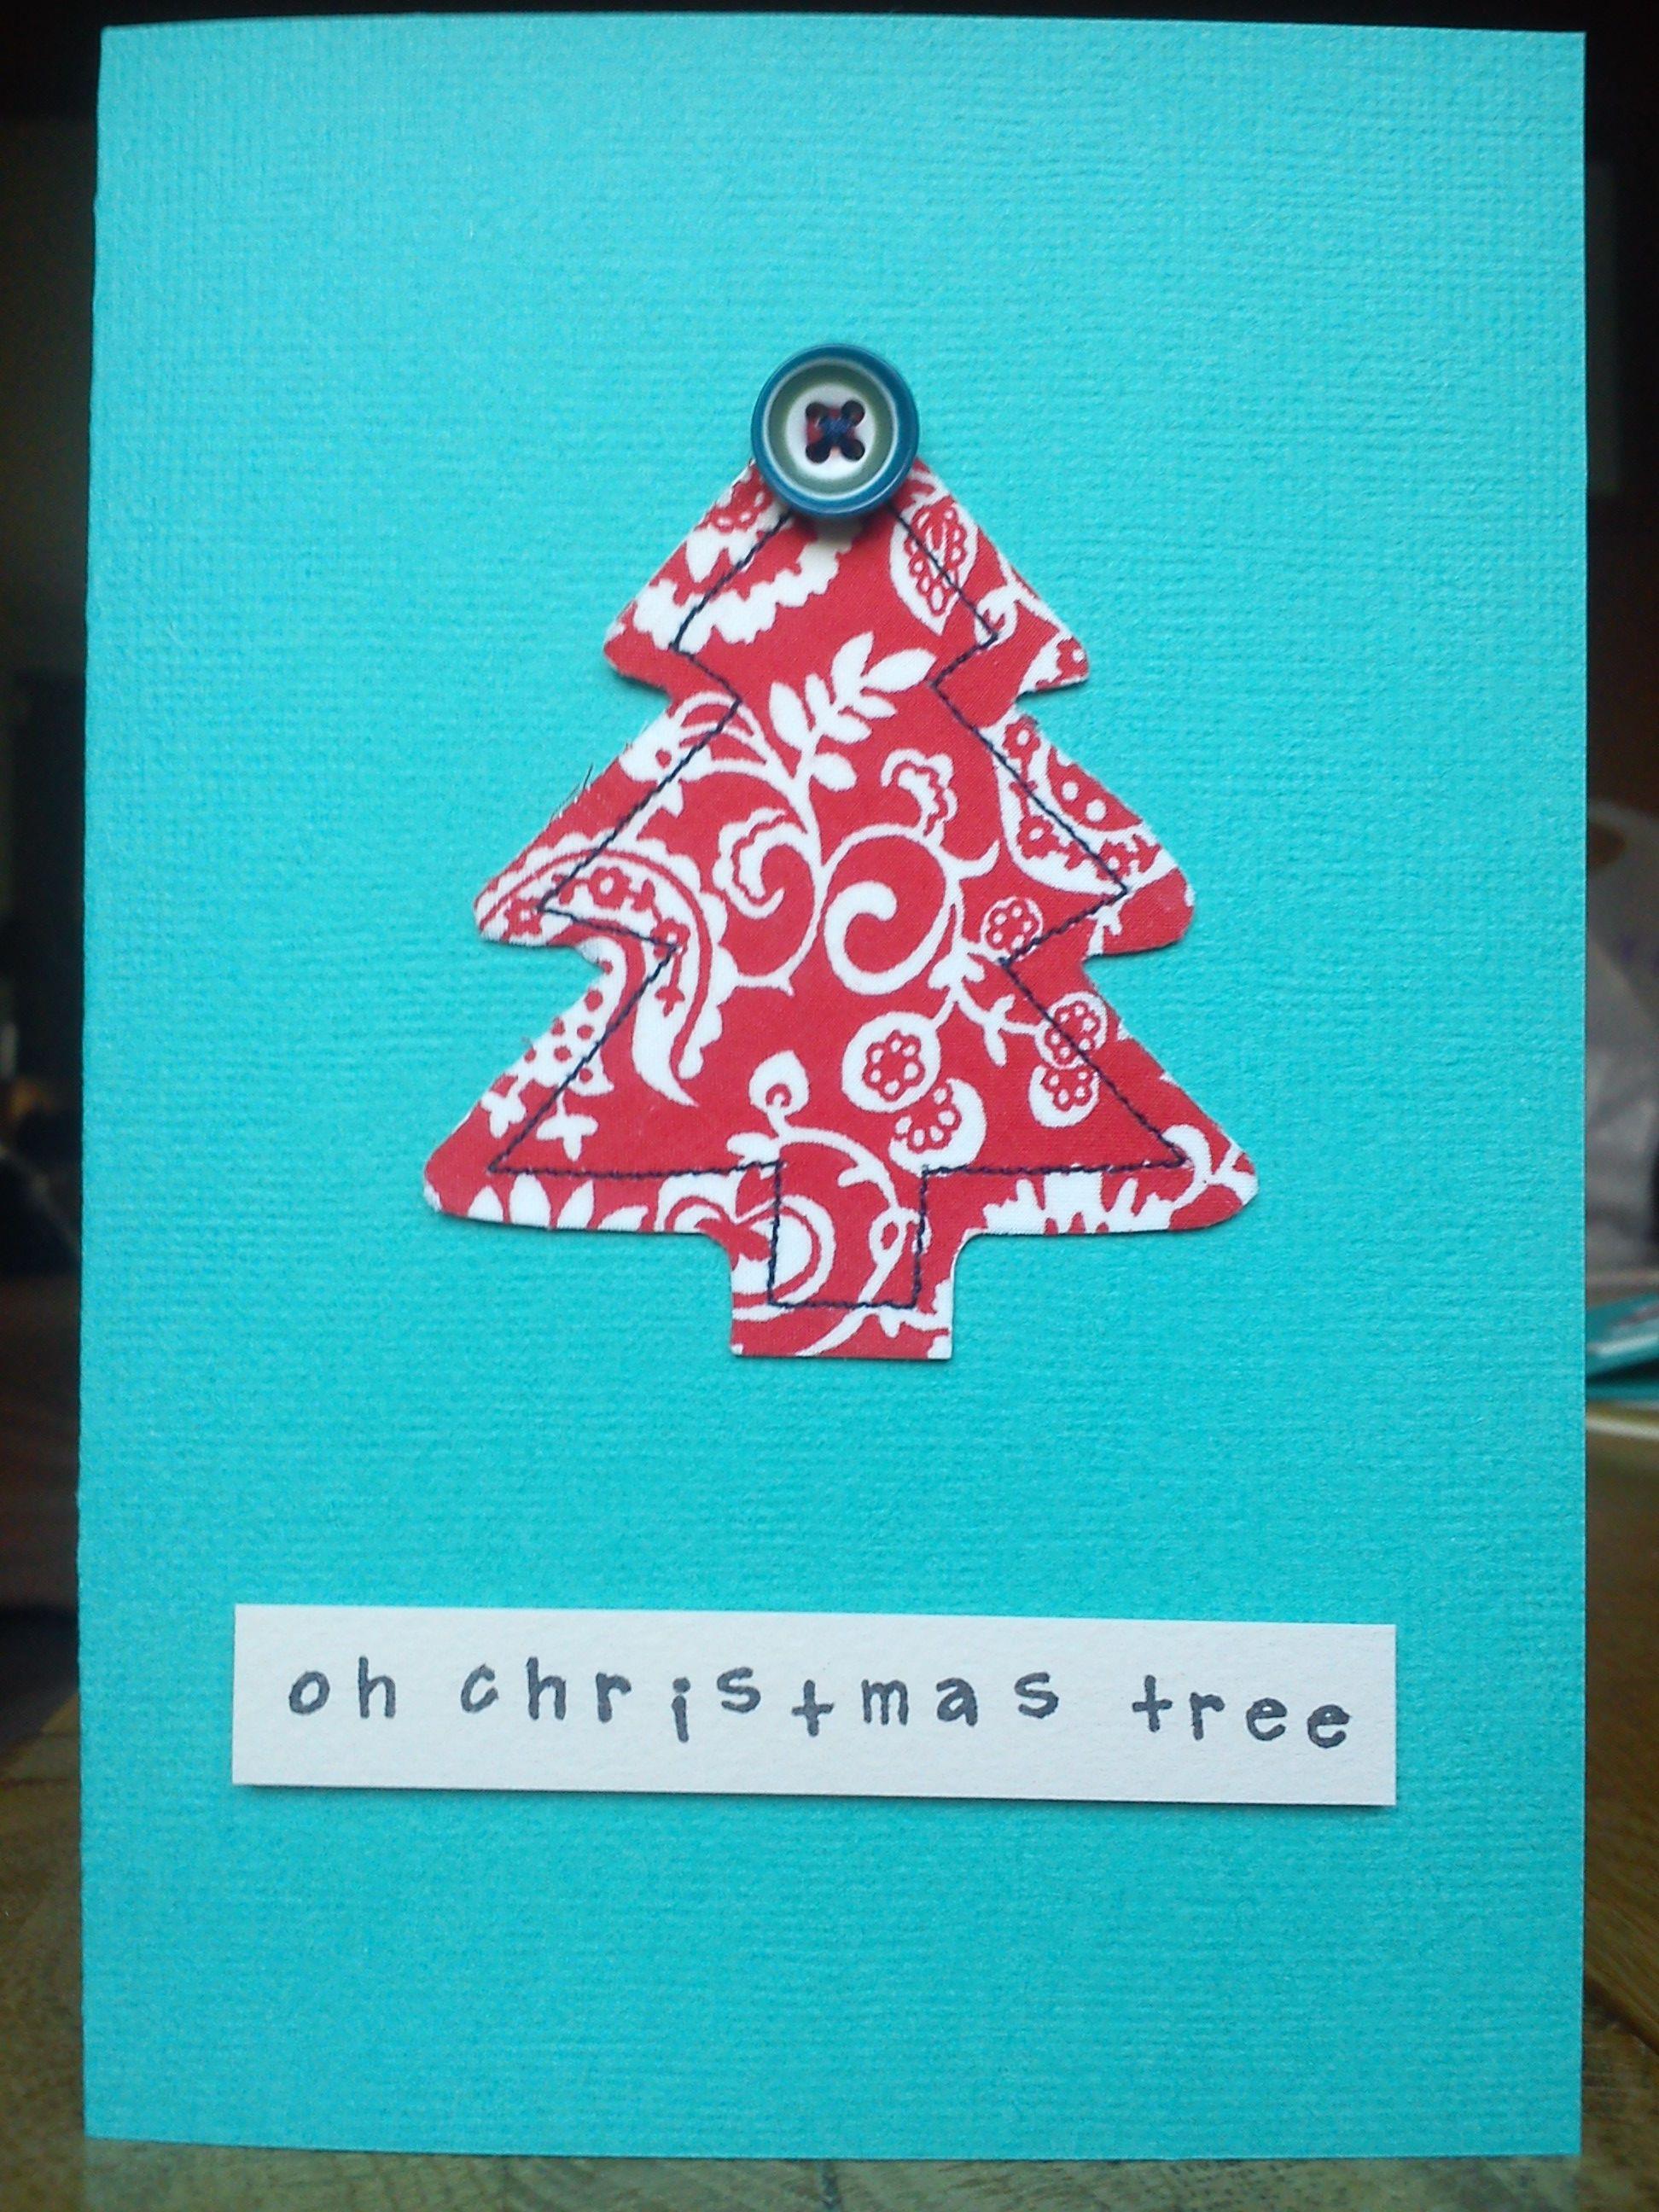 Handmade christmas robin decoration claire hurd design - Handsewn Christmas Tree Card Made With Liberty Fabric